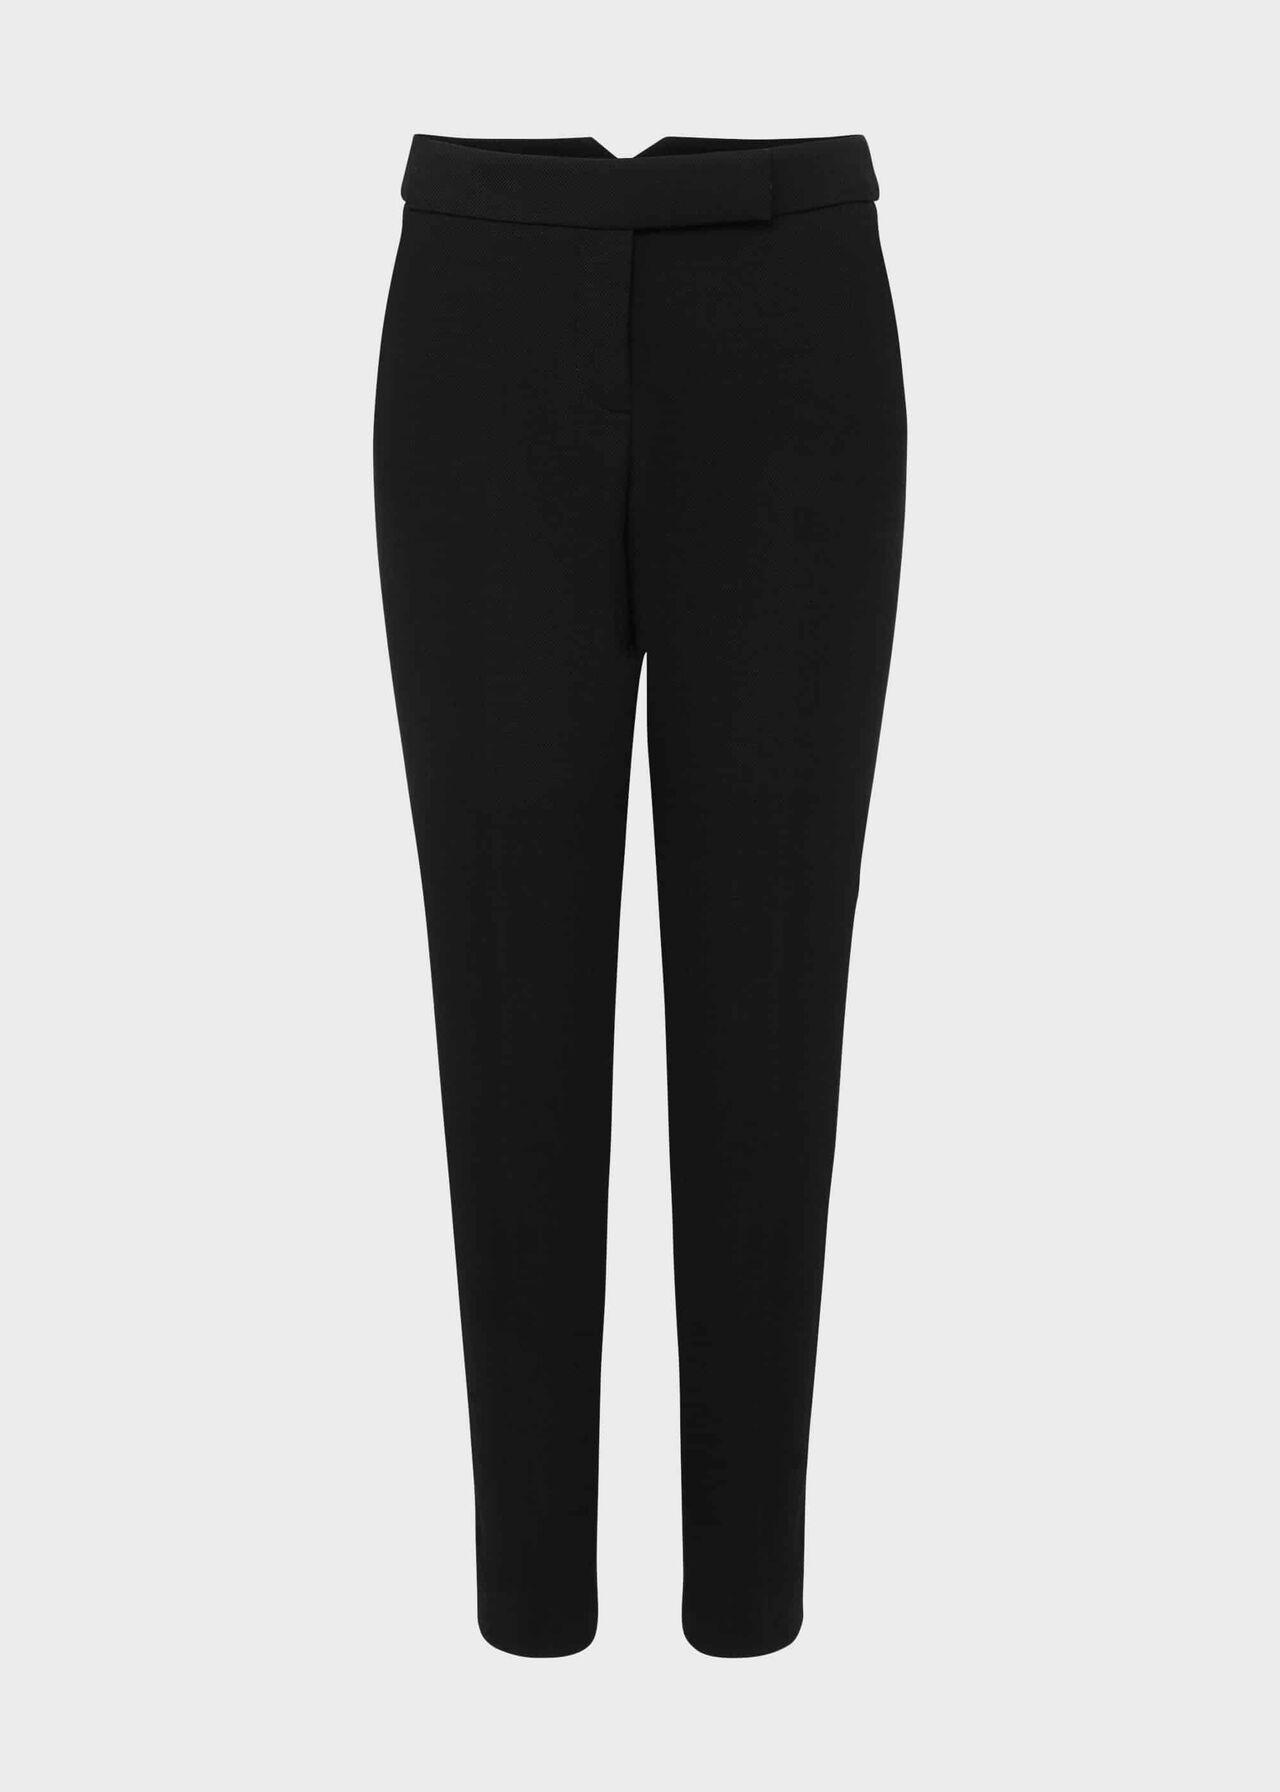 Ophelia Slim Trousers With Stretch Black